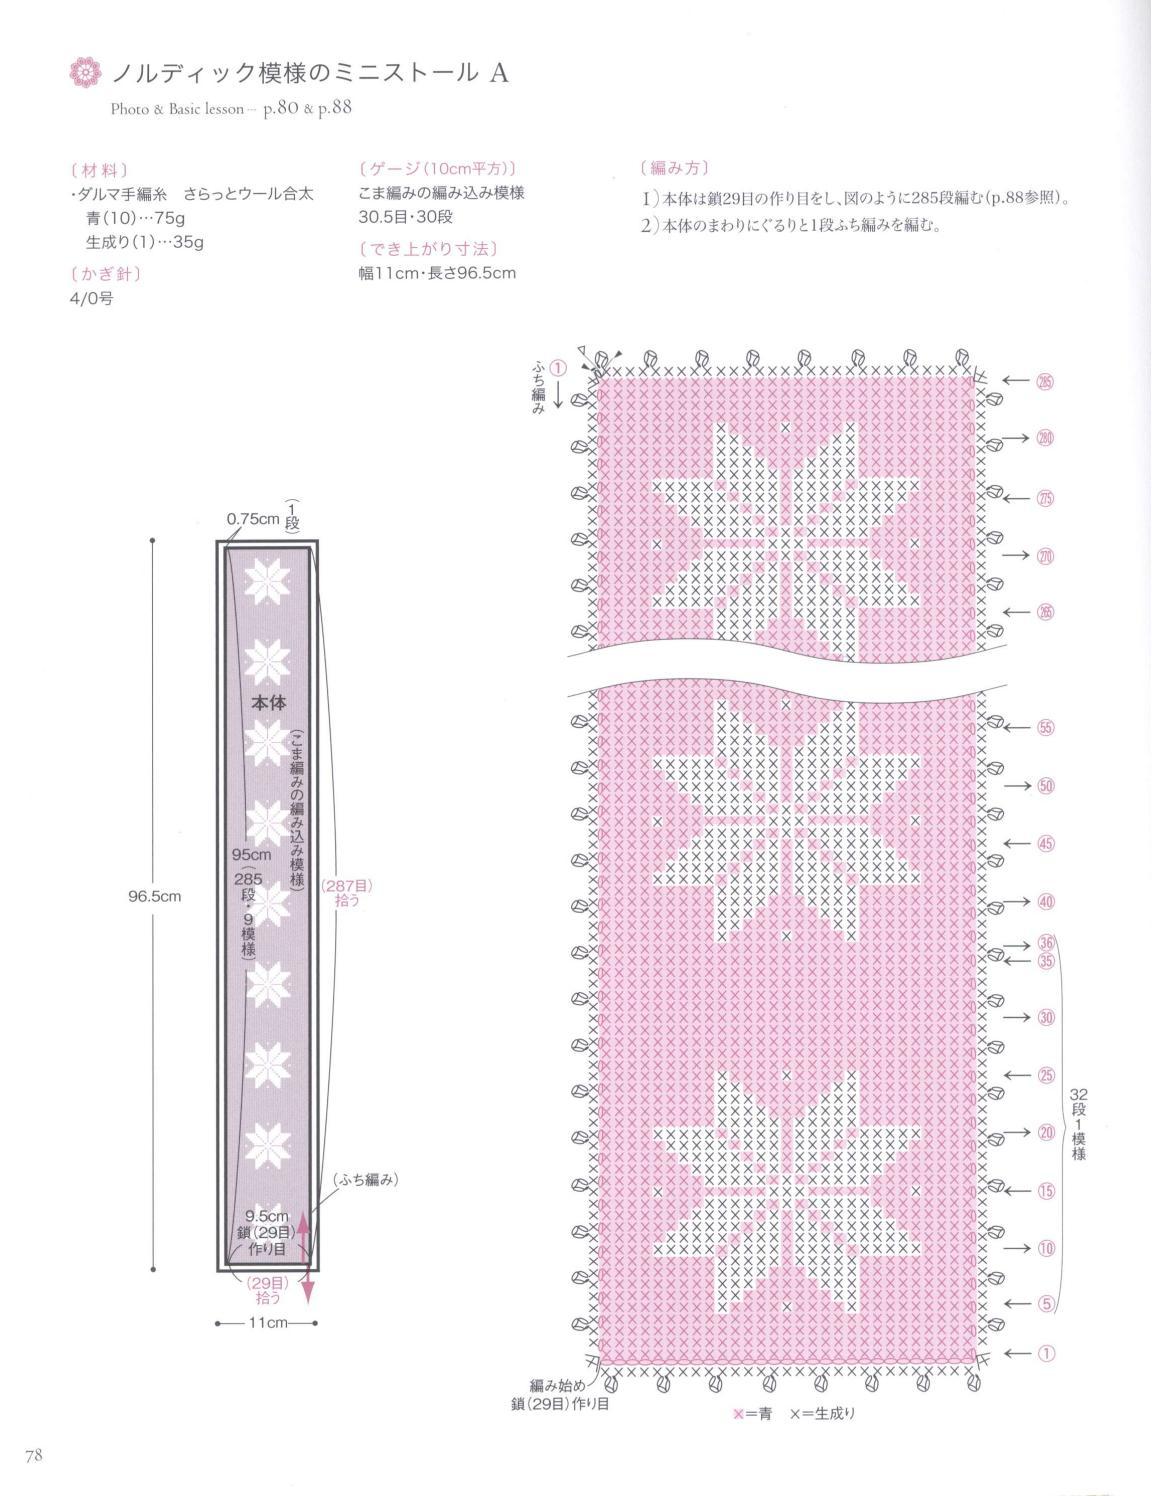 Asahi original crochet best selection 2012 page 78